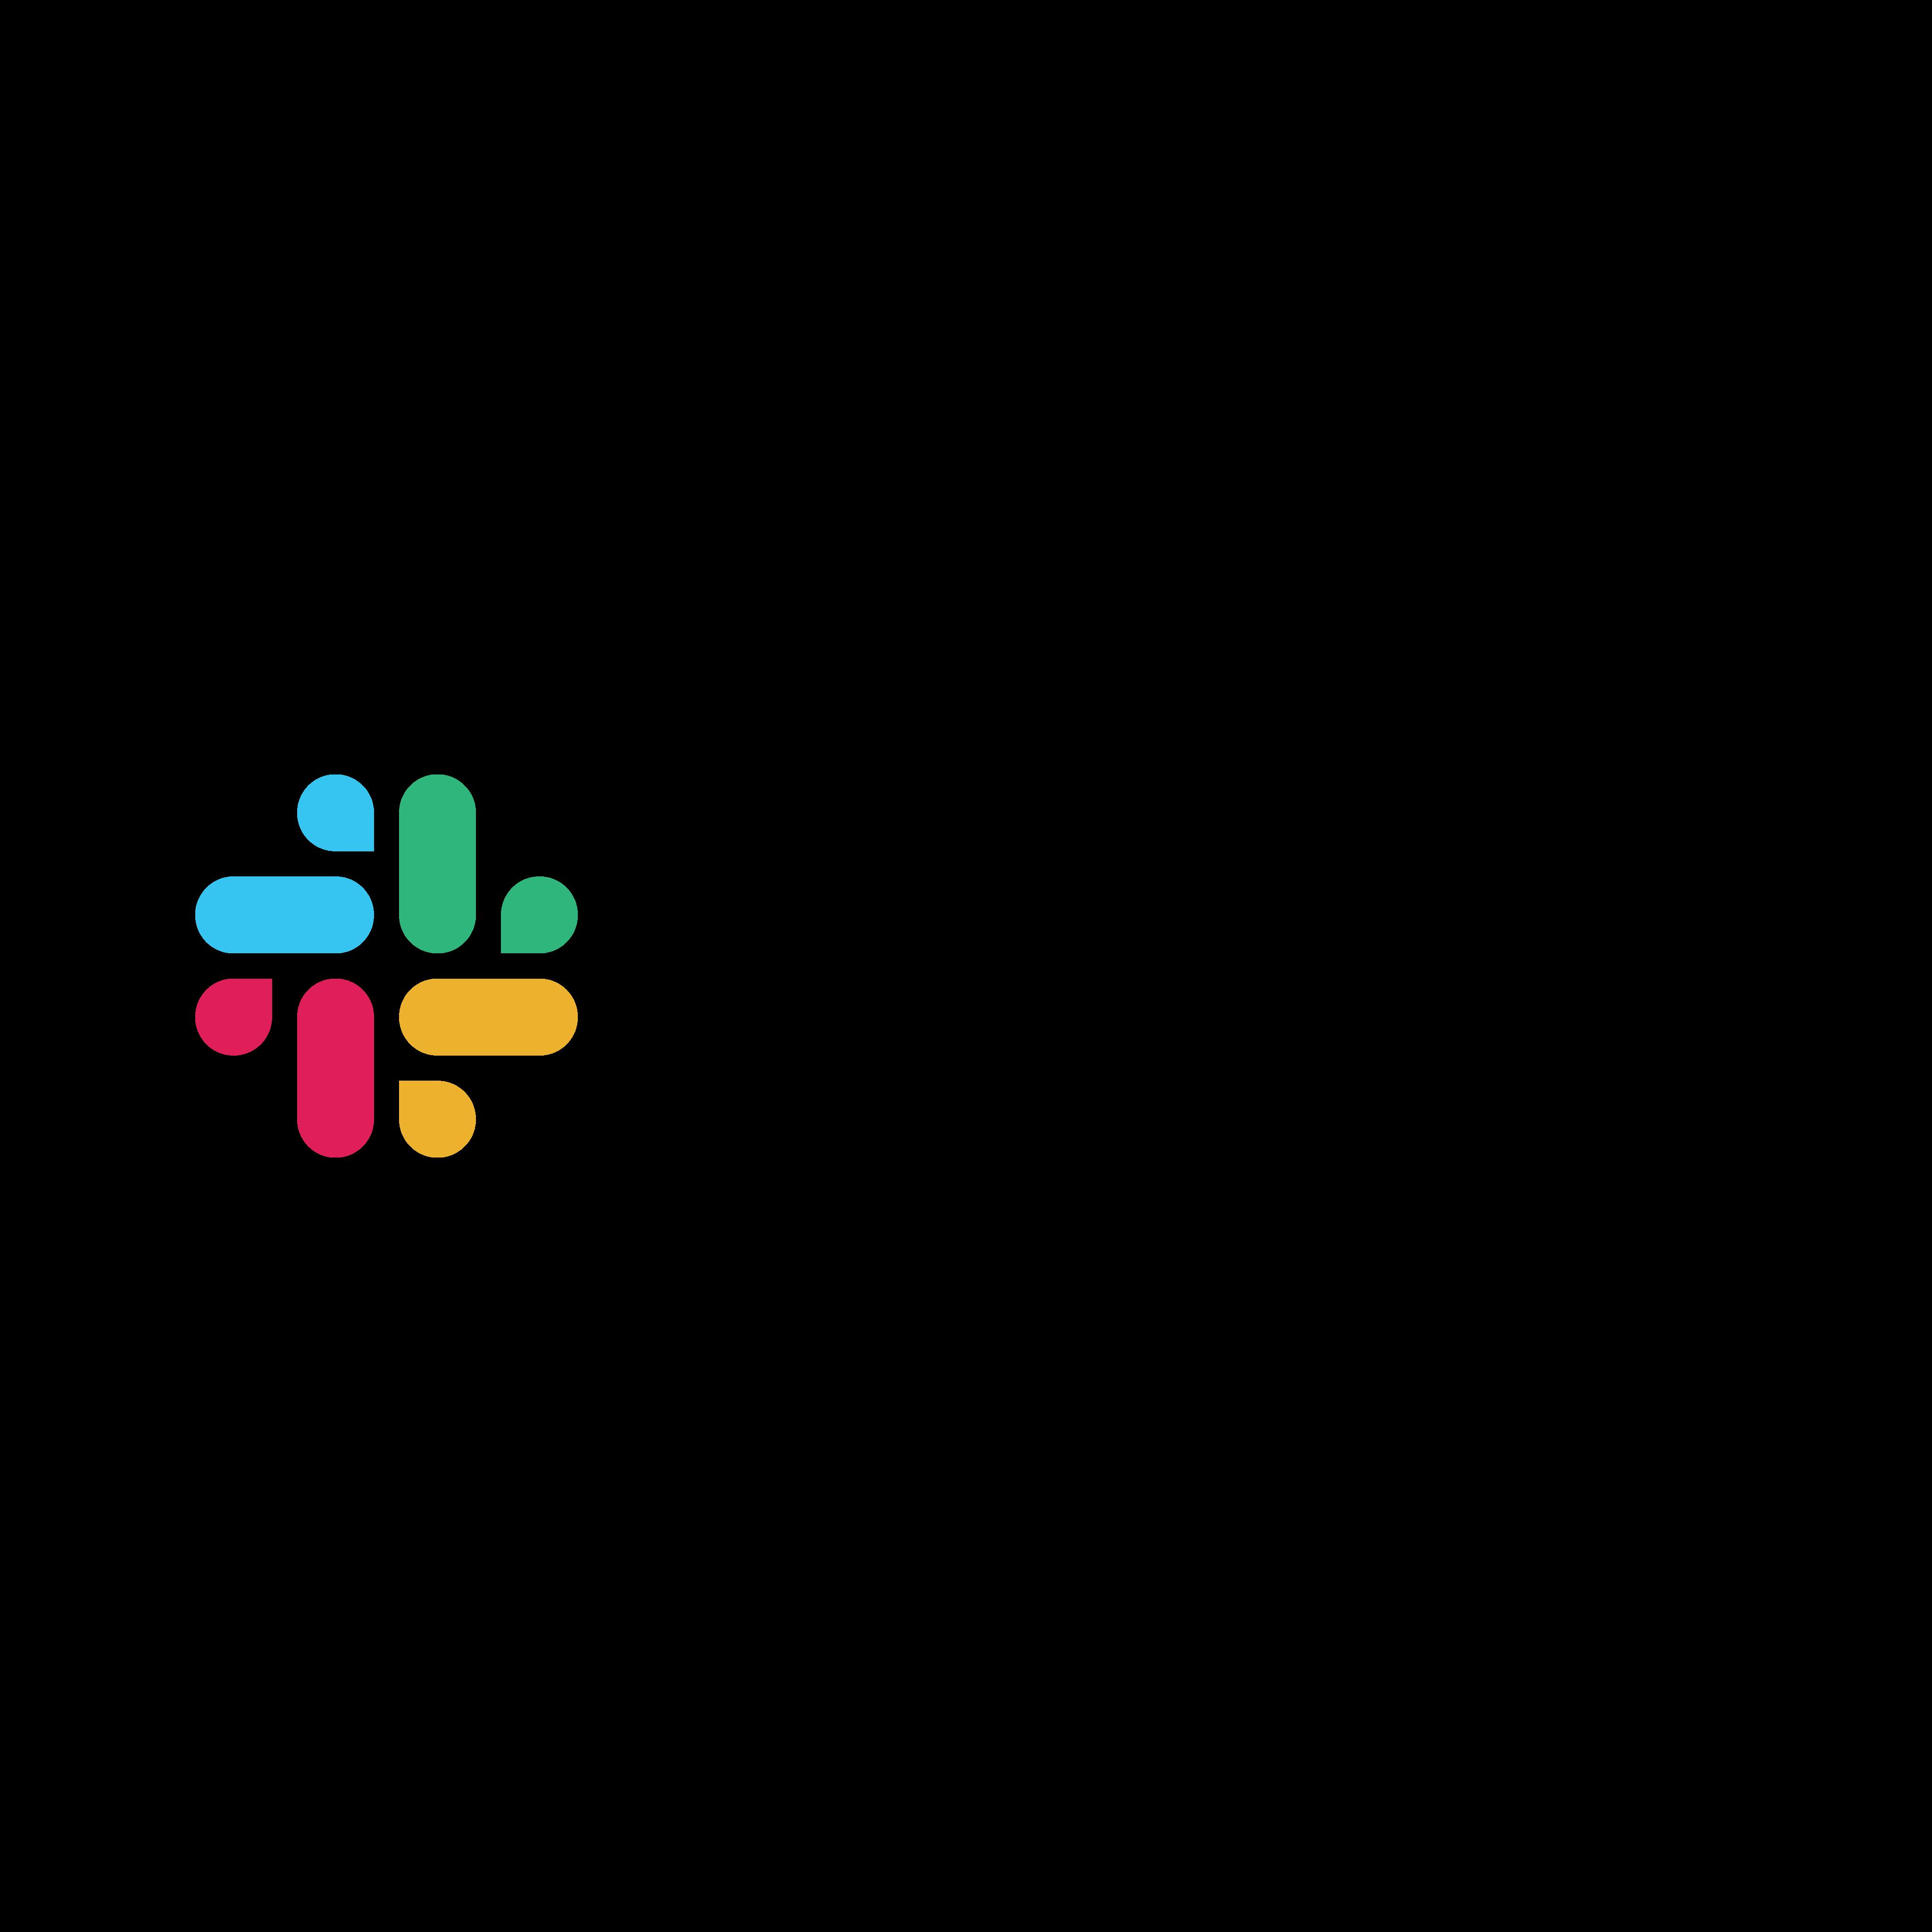 slack logo 0 - Slack Logo